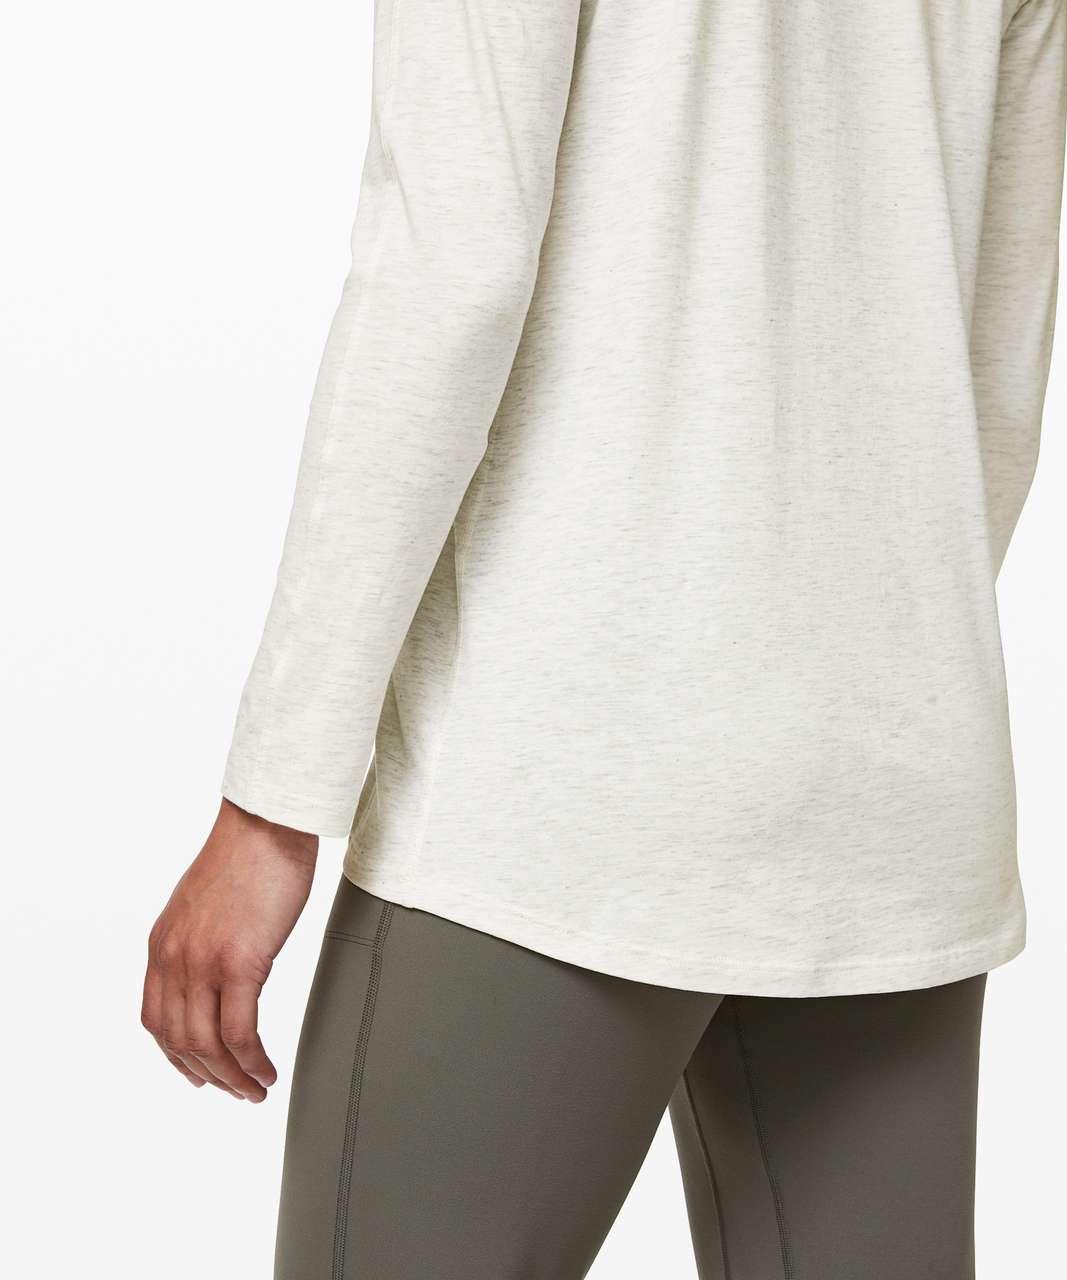 Lululemon Emerald Long Sleeve - Heathered Dove Grey